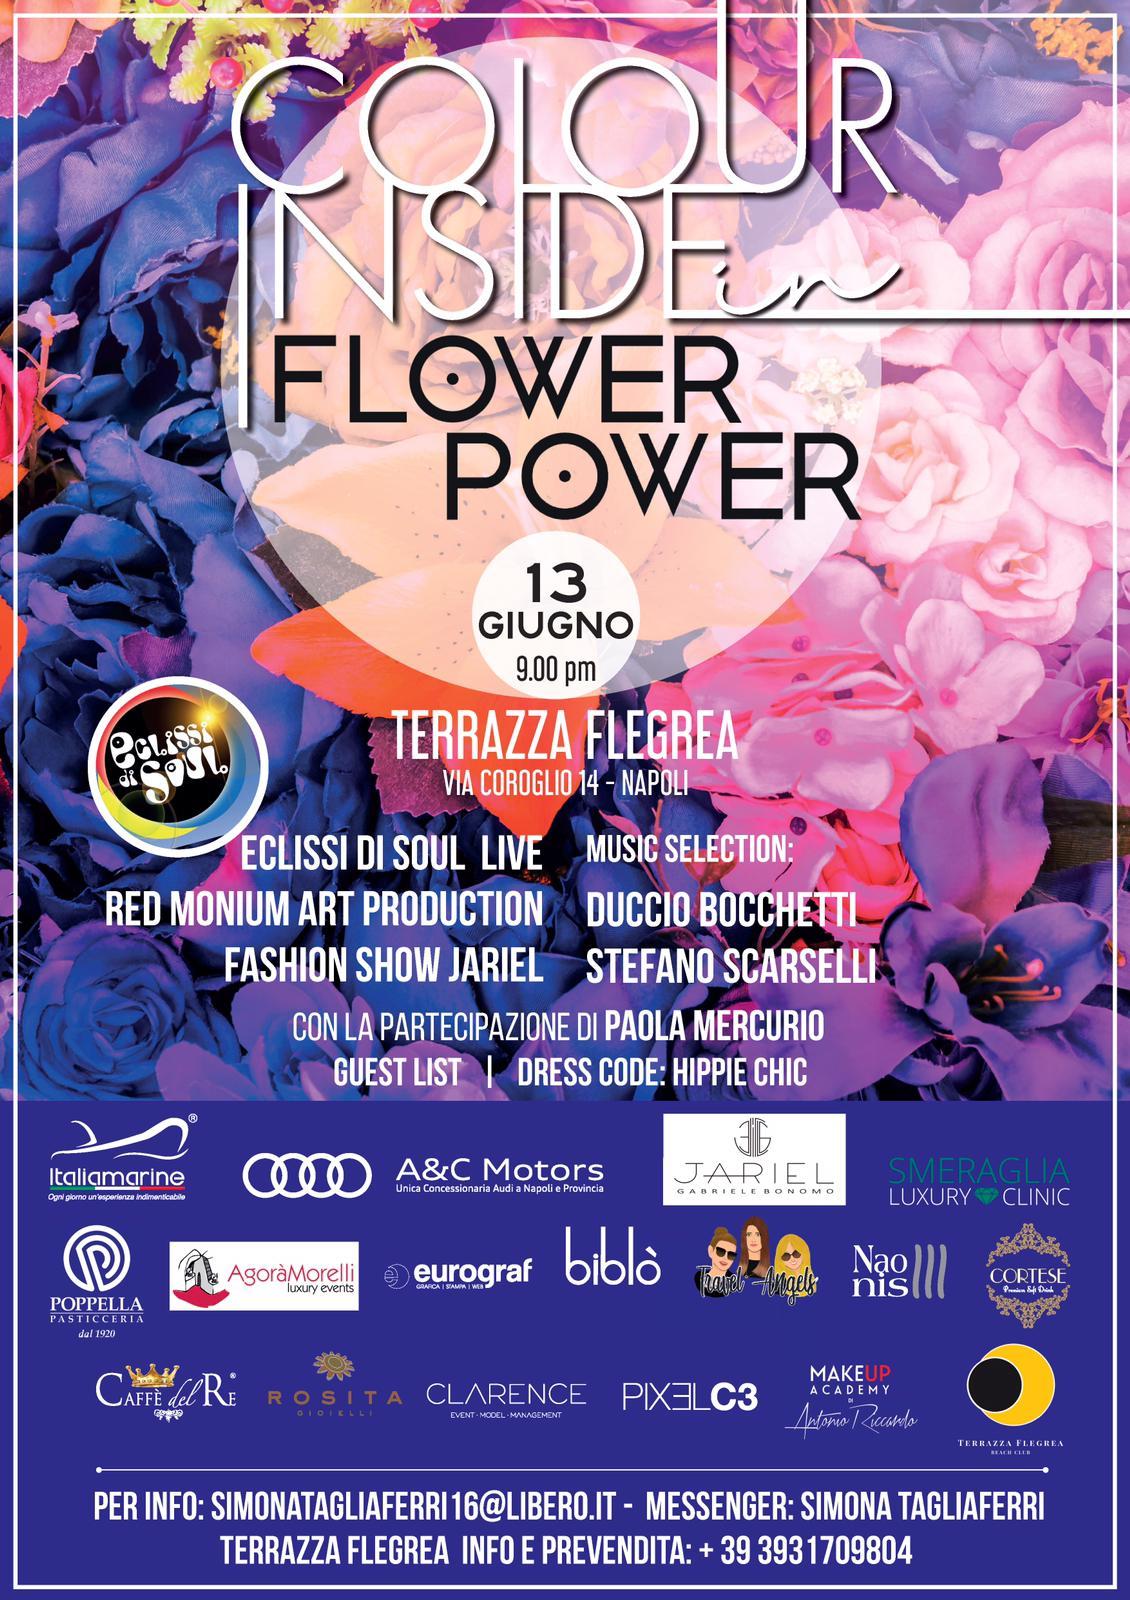 Colour Inside In Flower Power Terrazza Flegrea Interno